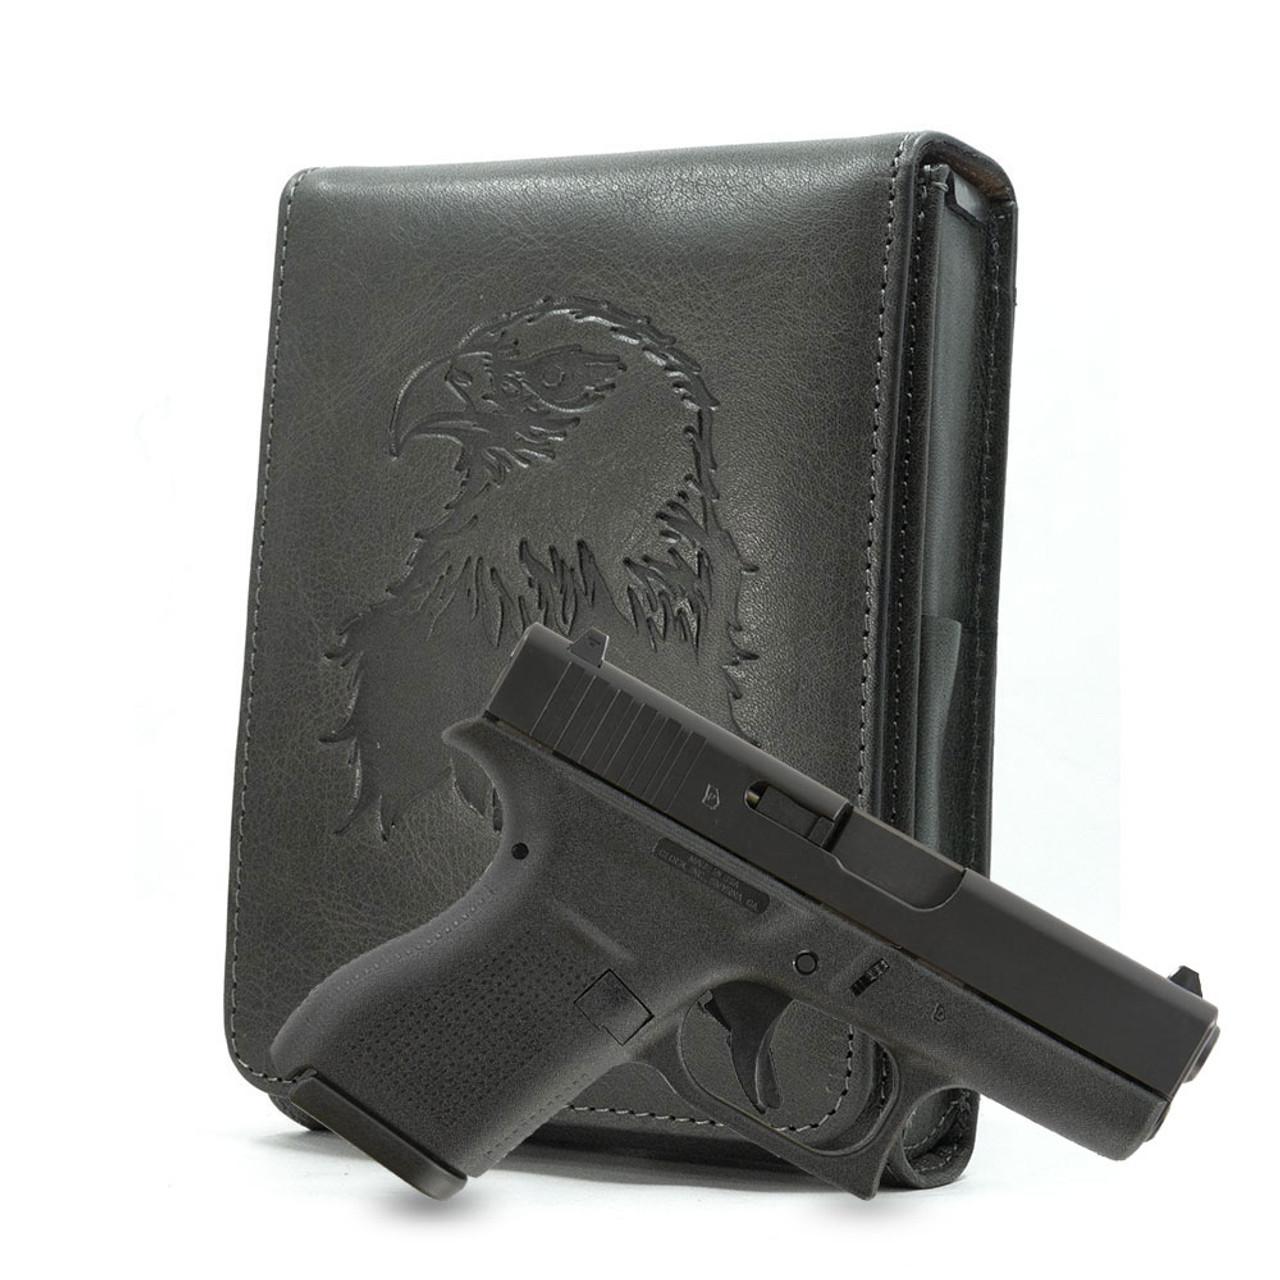 Glock 42 Black Freedom Series Holster